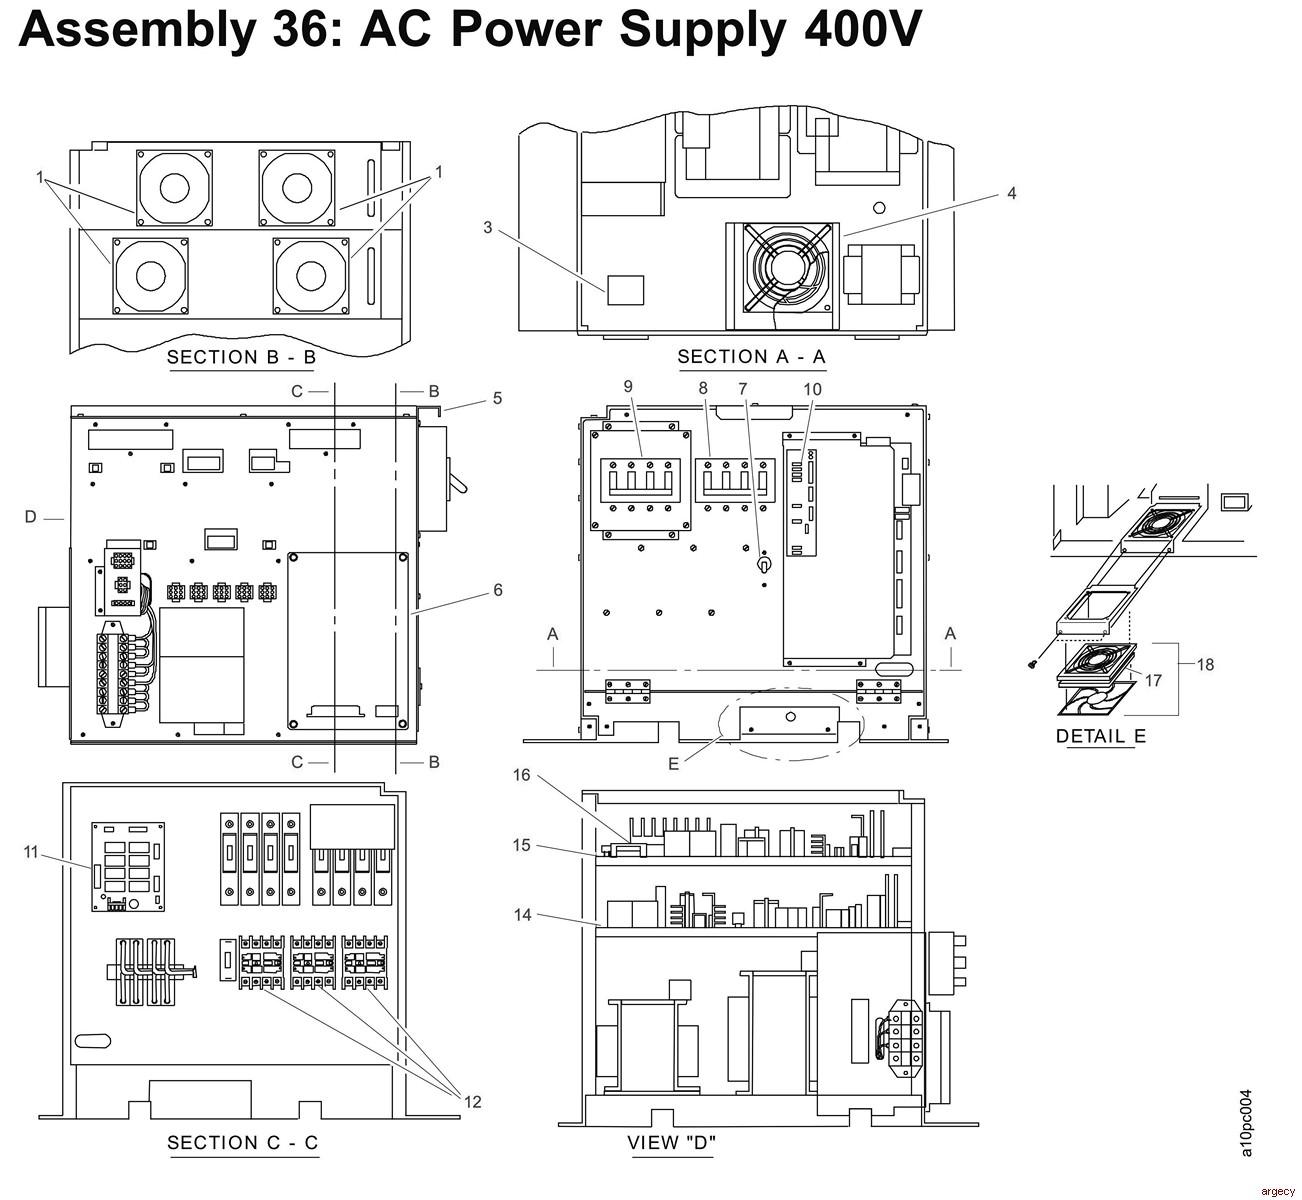 Assembly 32 Fuser Control Box Thru 36 Ac Power Supply